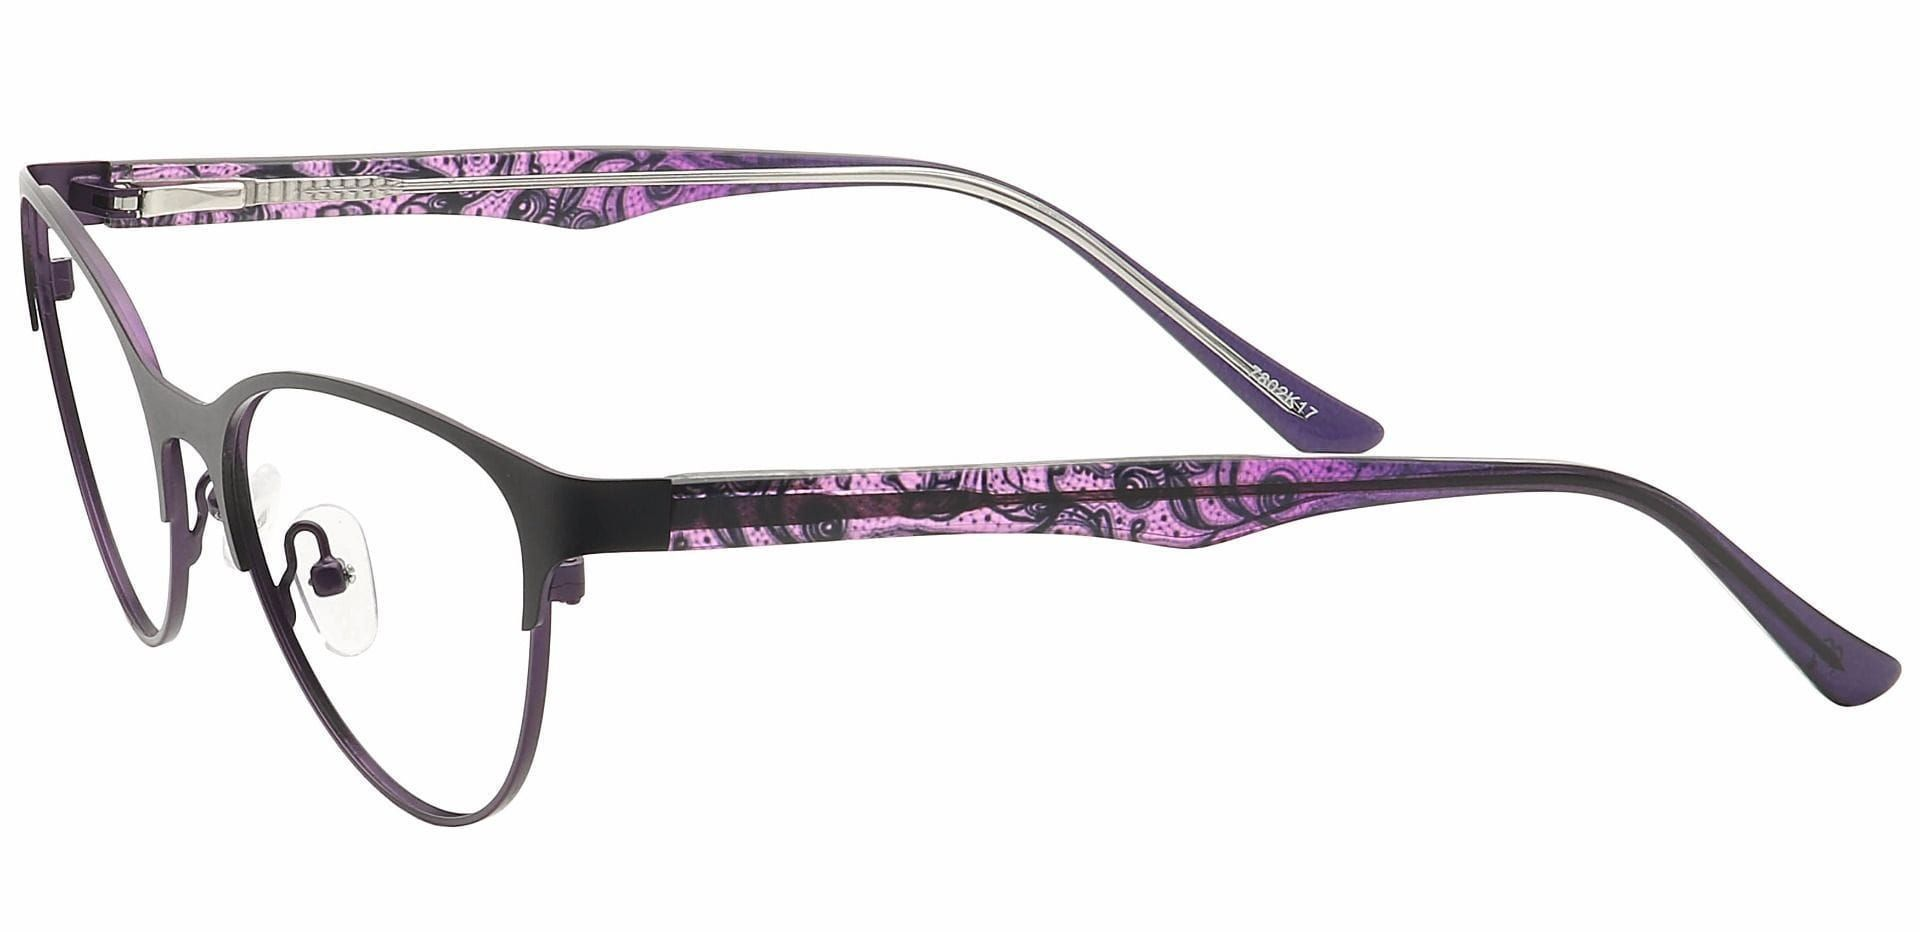 Jorde Cat-Eye Non-Rx Glasses - Purple